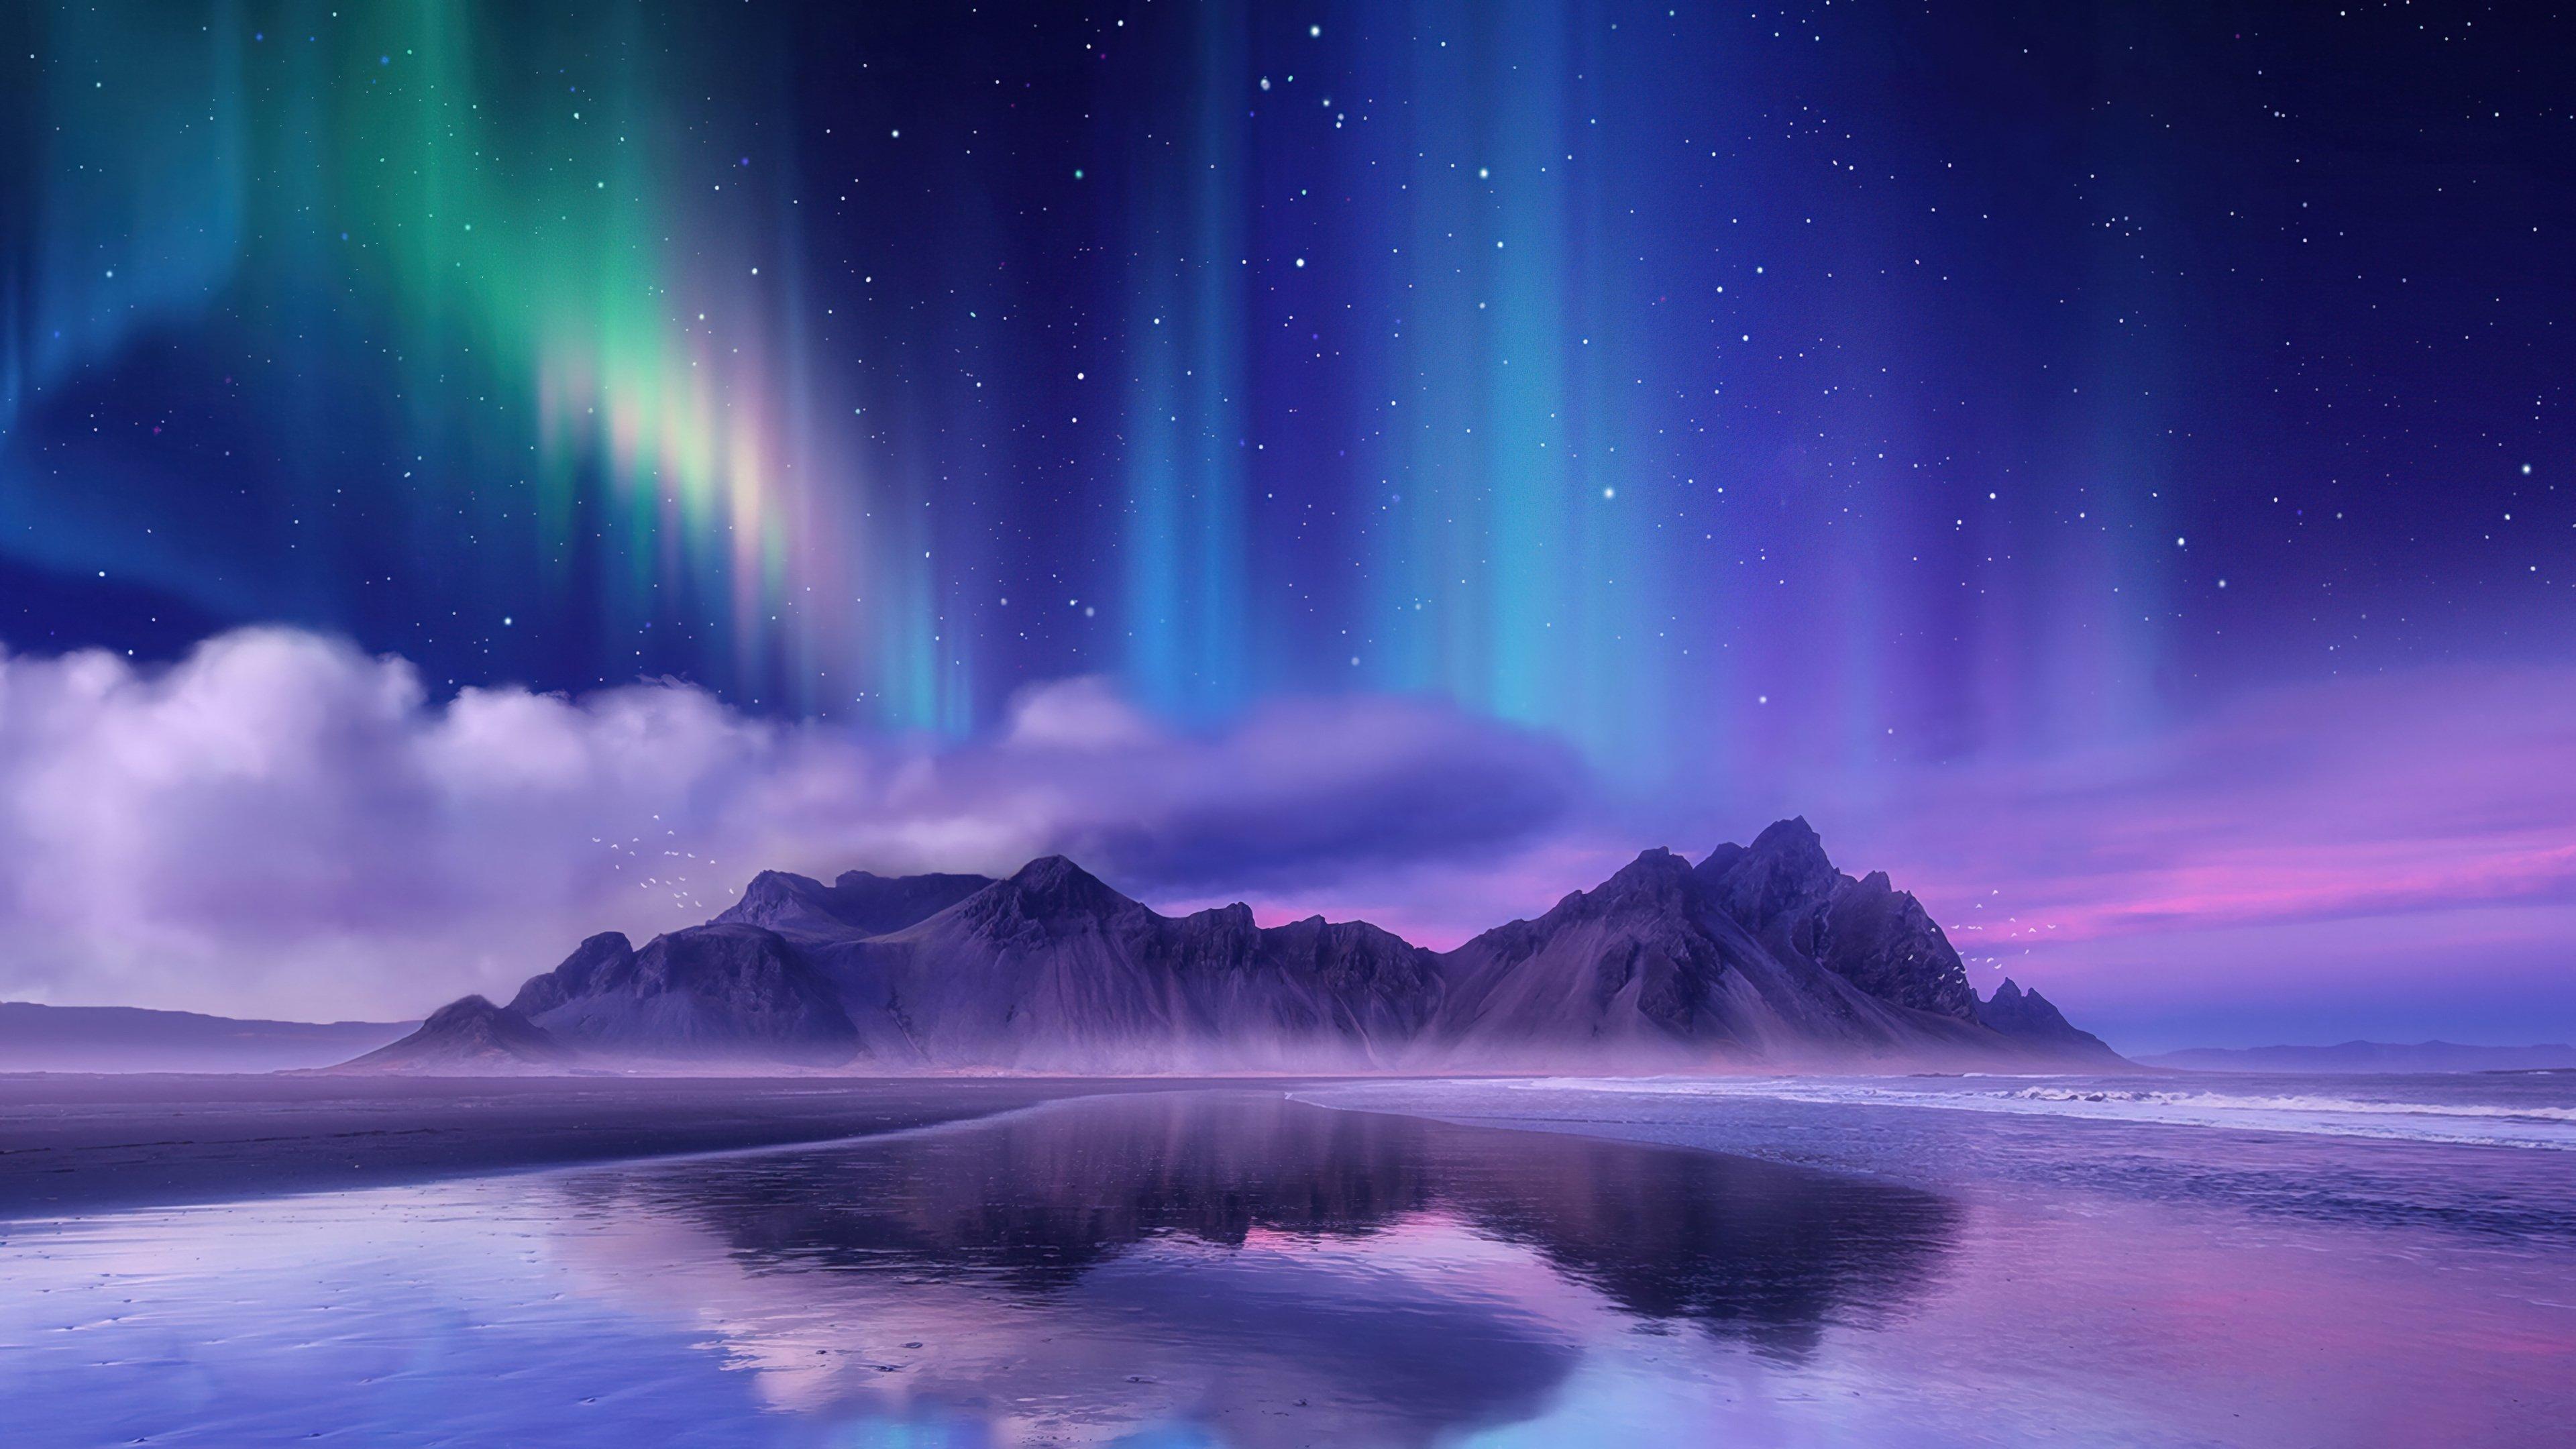 Wallpaper Aurora Borealis in mountains Digital Art